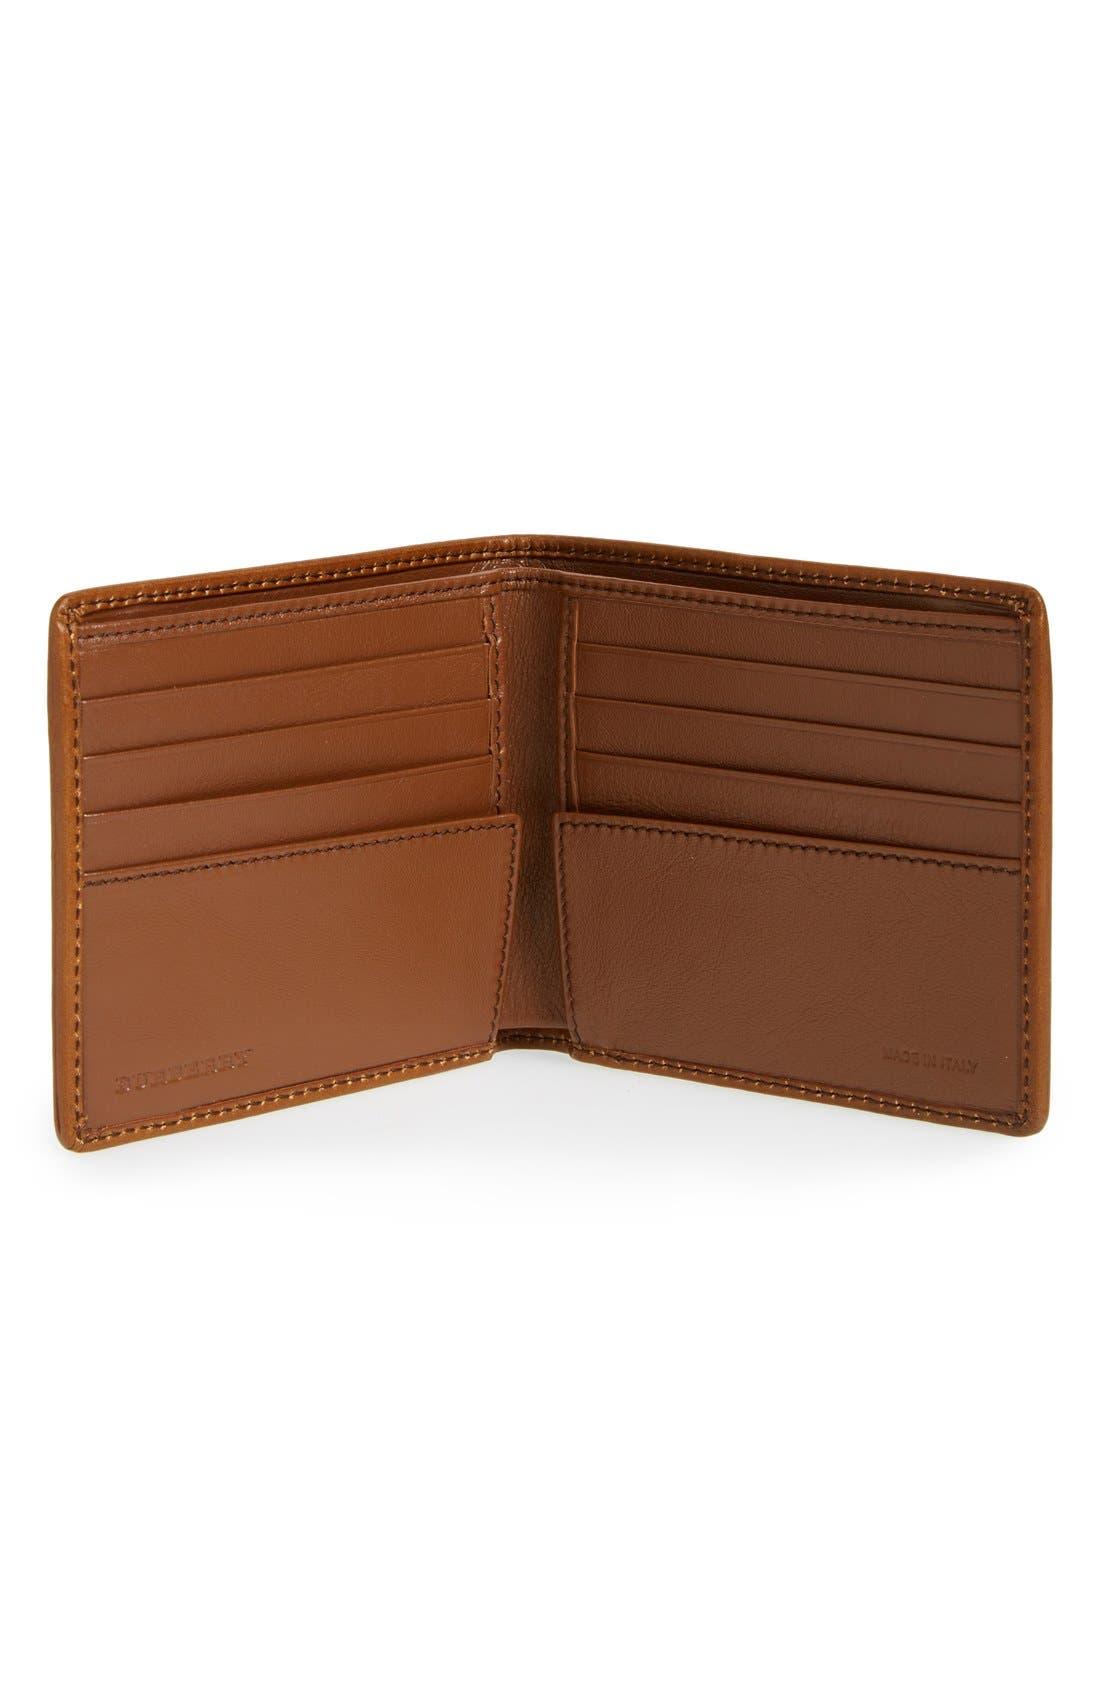 Horseferry Check Billfold Wallet,                             Alternate thumbnail 2, color,                             216